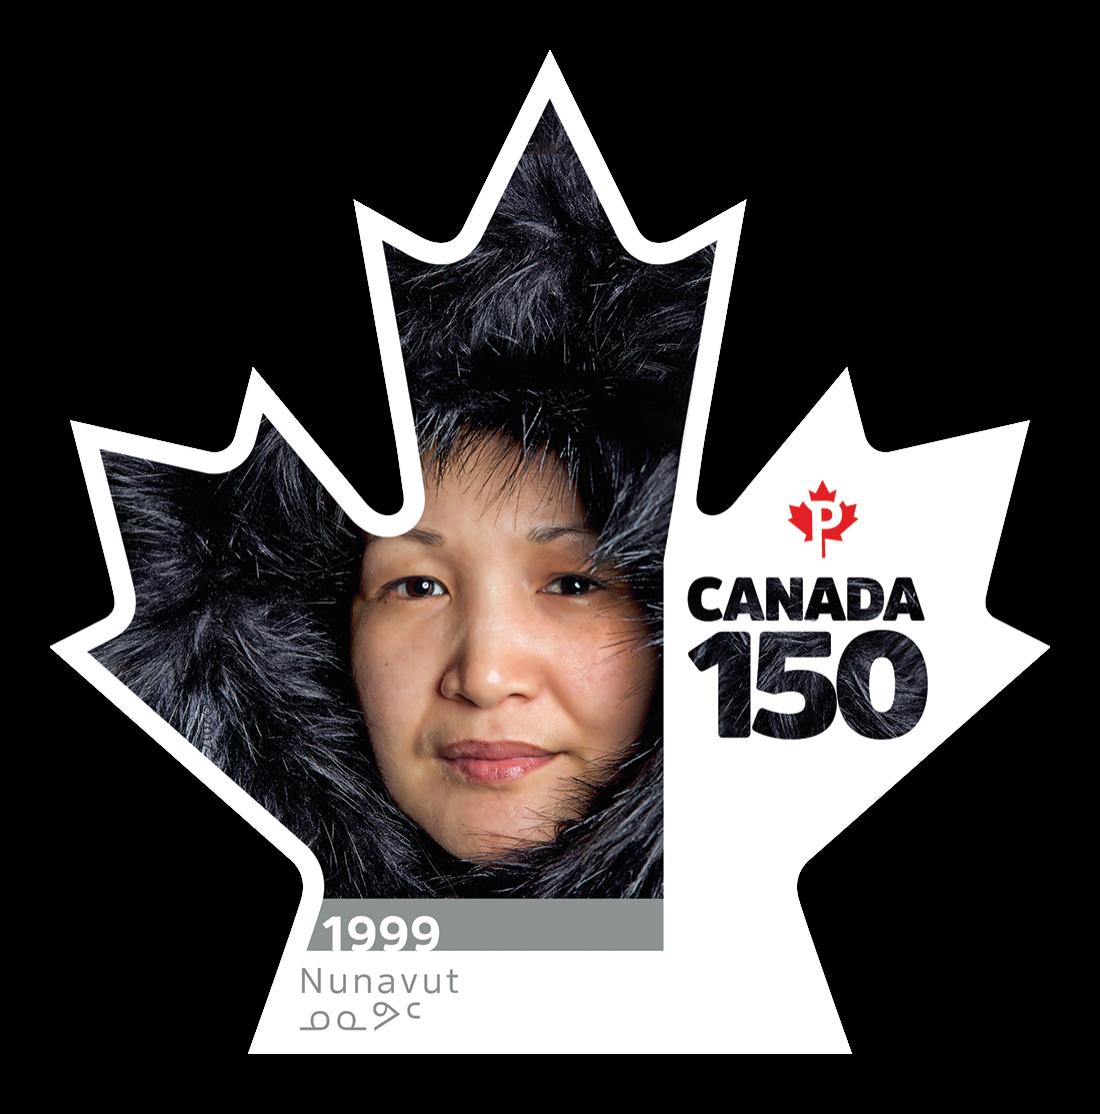 Nunavut  (ᓄᓇᕗᑦ) - Canada 150 Canada Postage Stamp | Canada 150